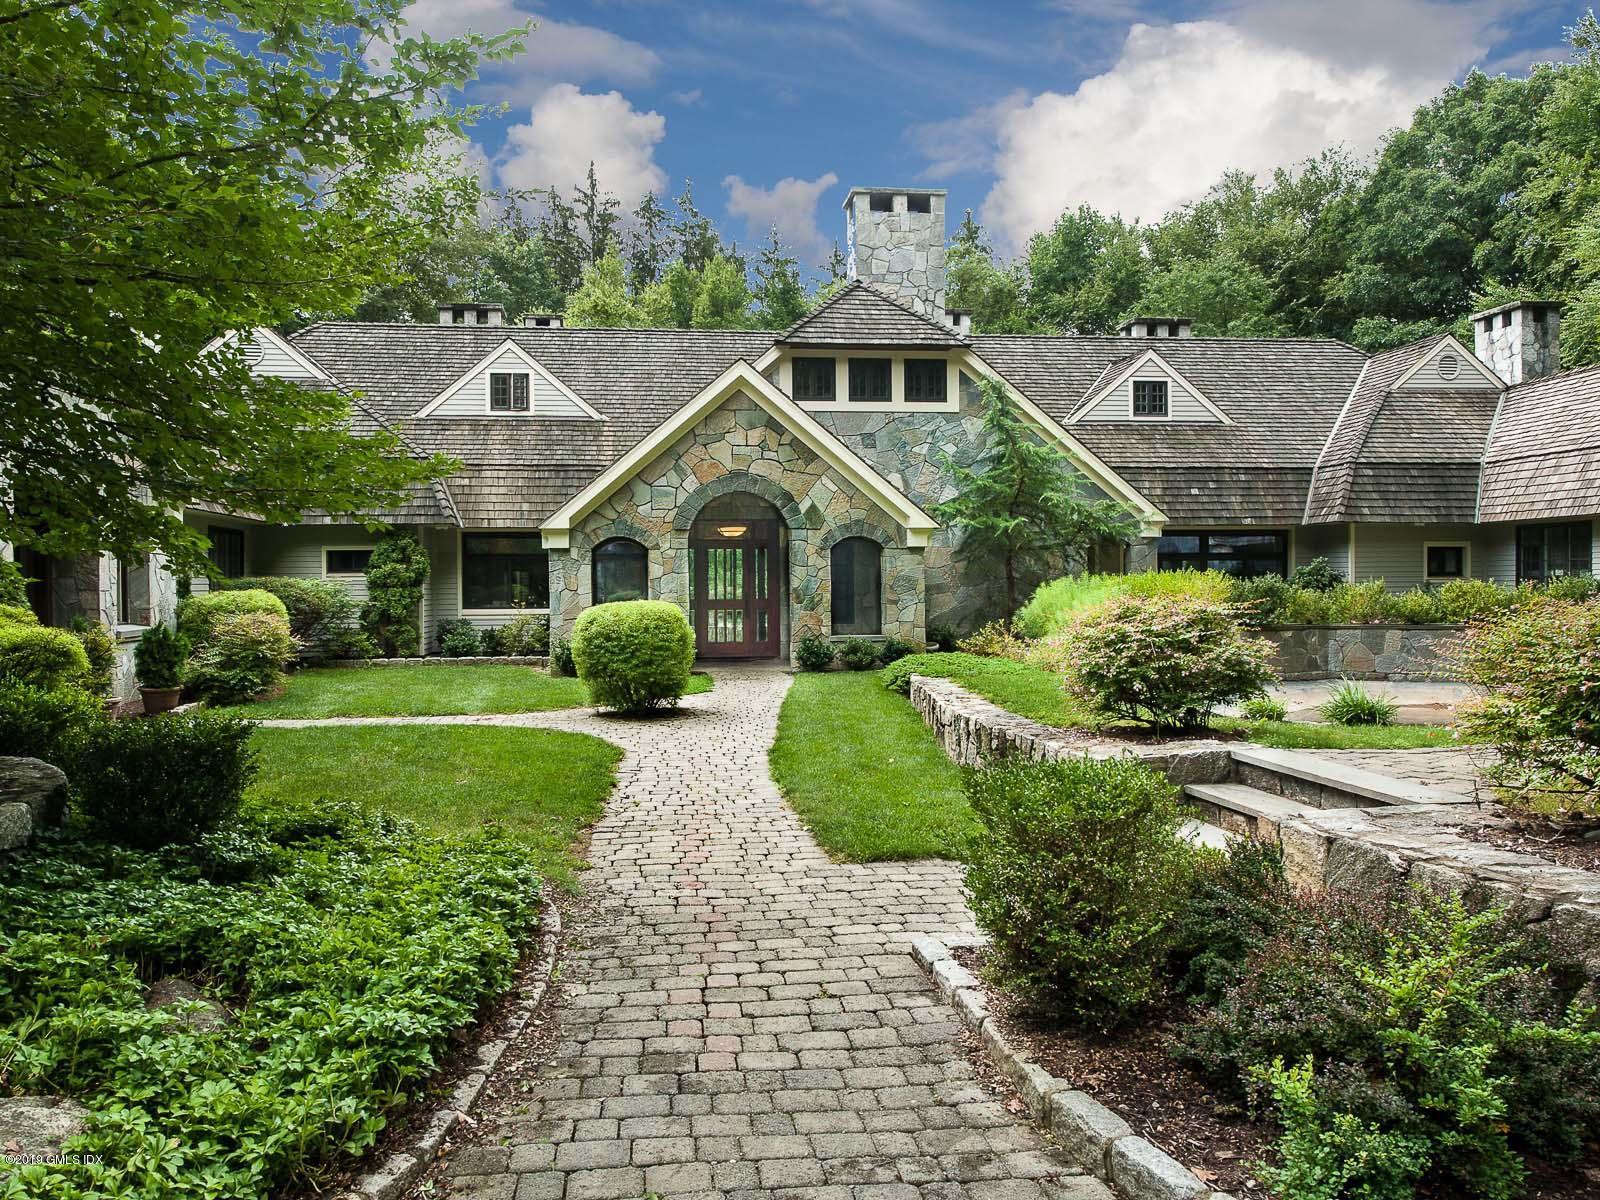 17 Heronvue Road,Greenwich,Connecticut 06831,6 Bedrooms Bedrooms,7 BathroomsBathrooms,Single family,Heronvue,105362